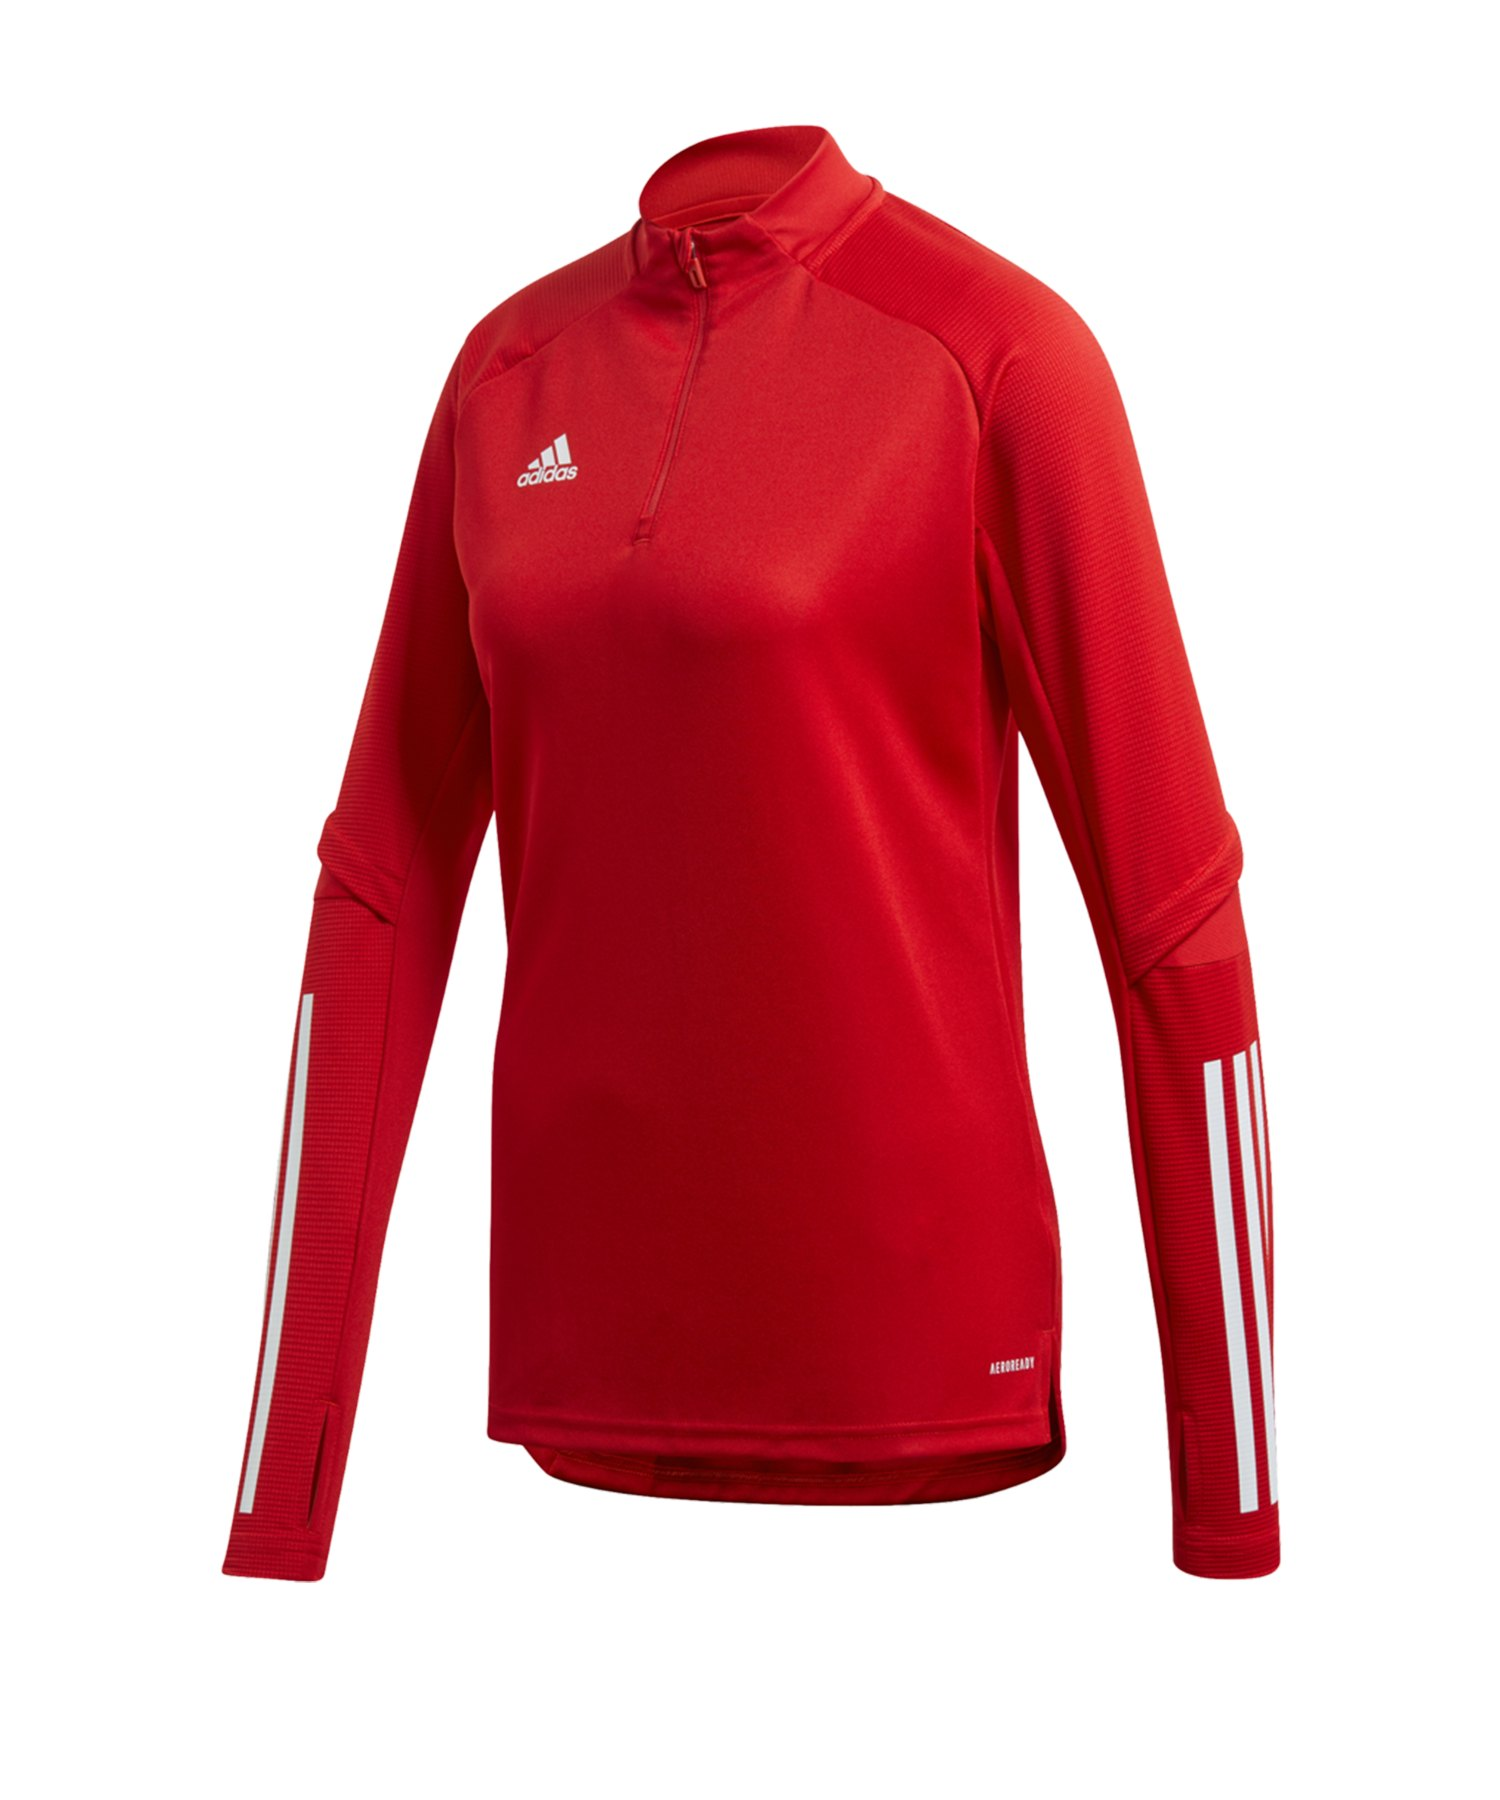 adidas Condivo 20 Trainingstop LA Damen Rot Weiss - rot